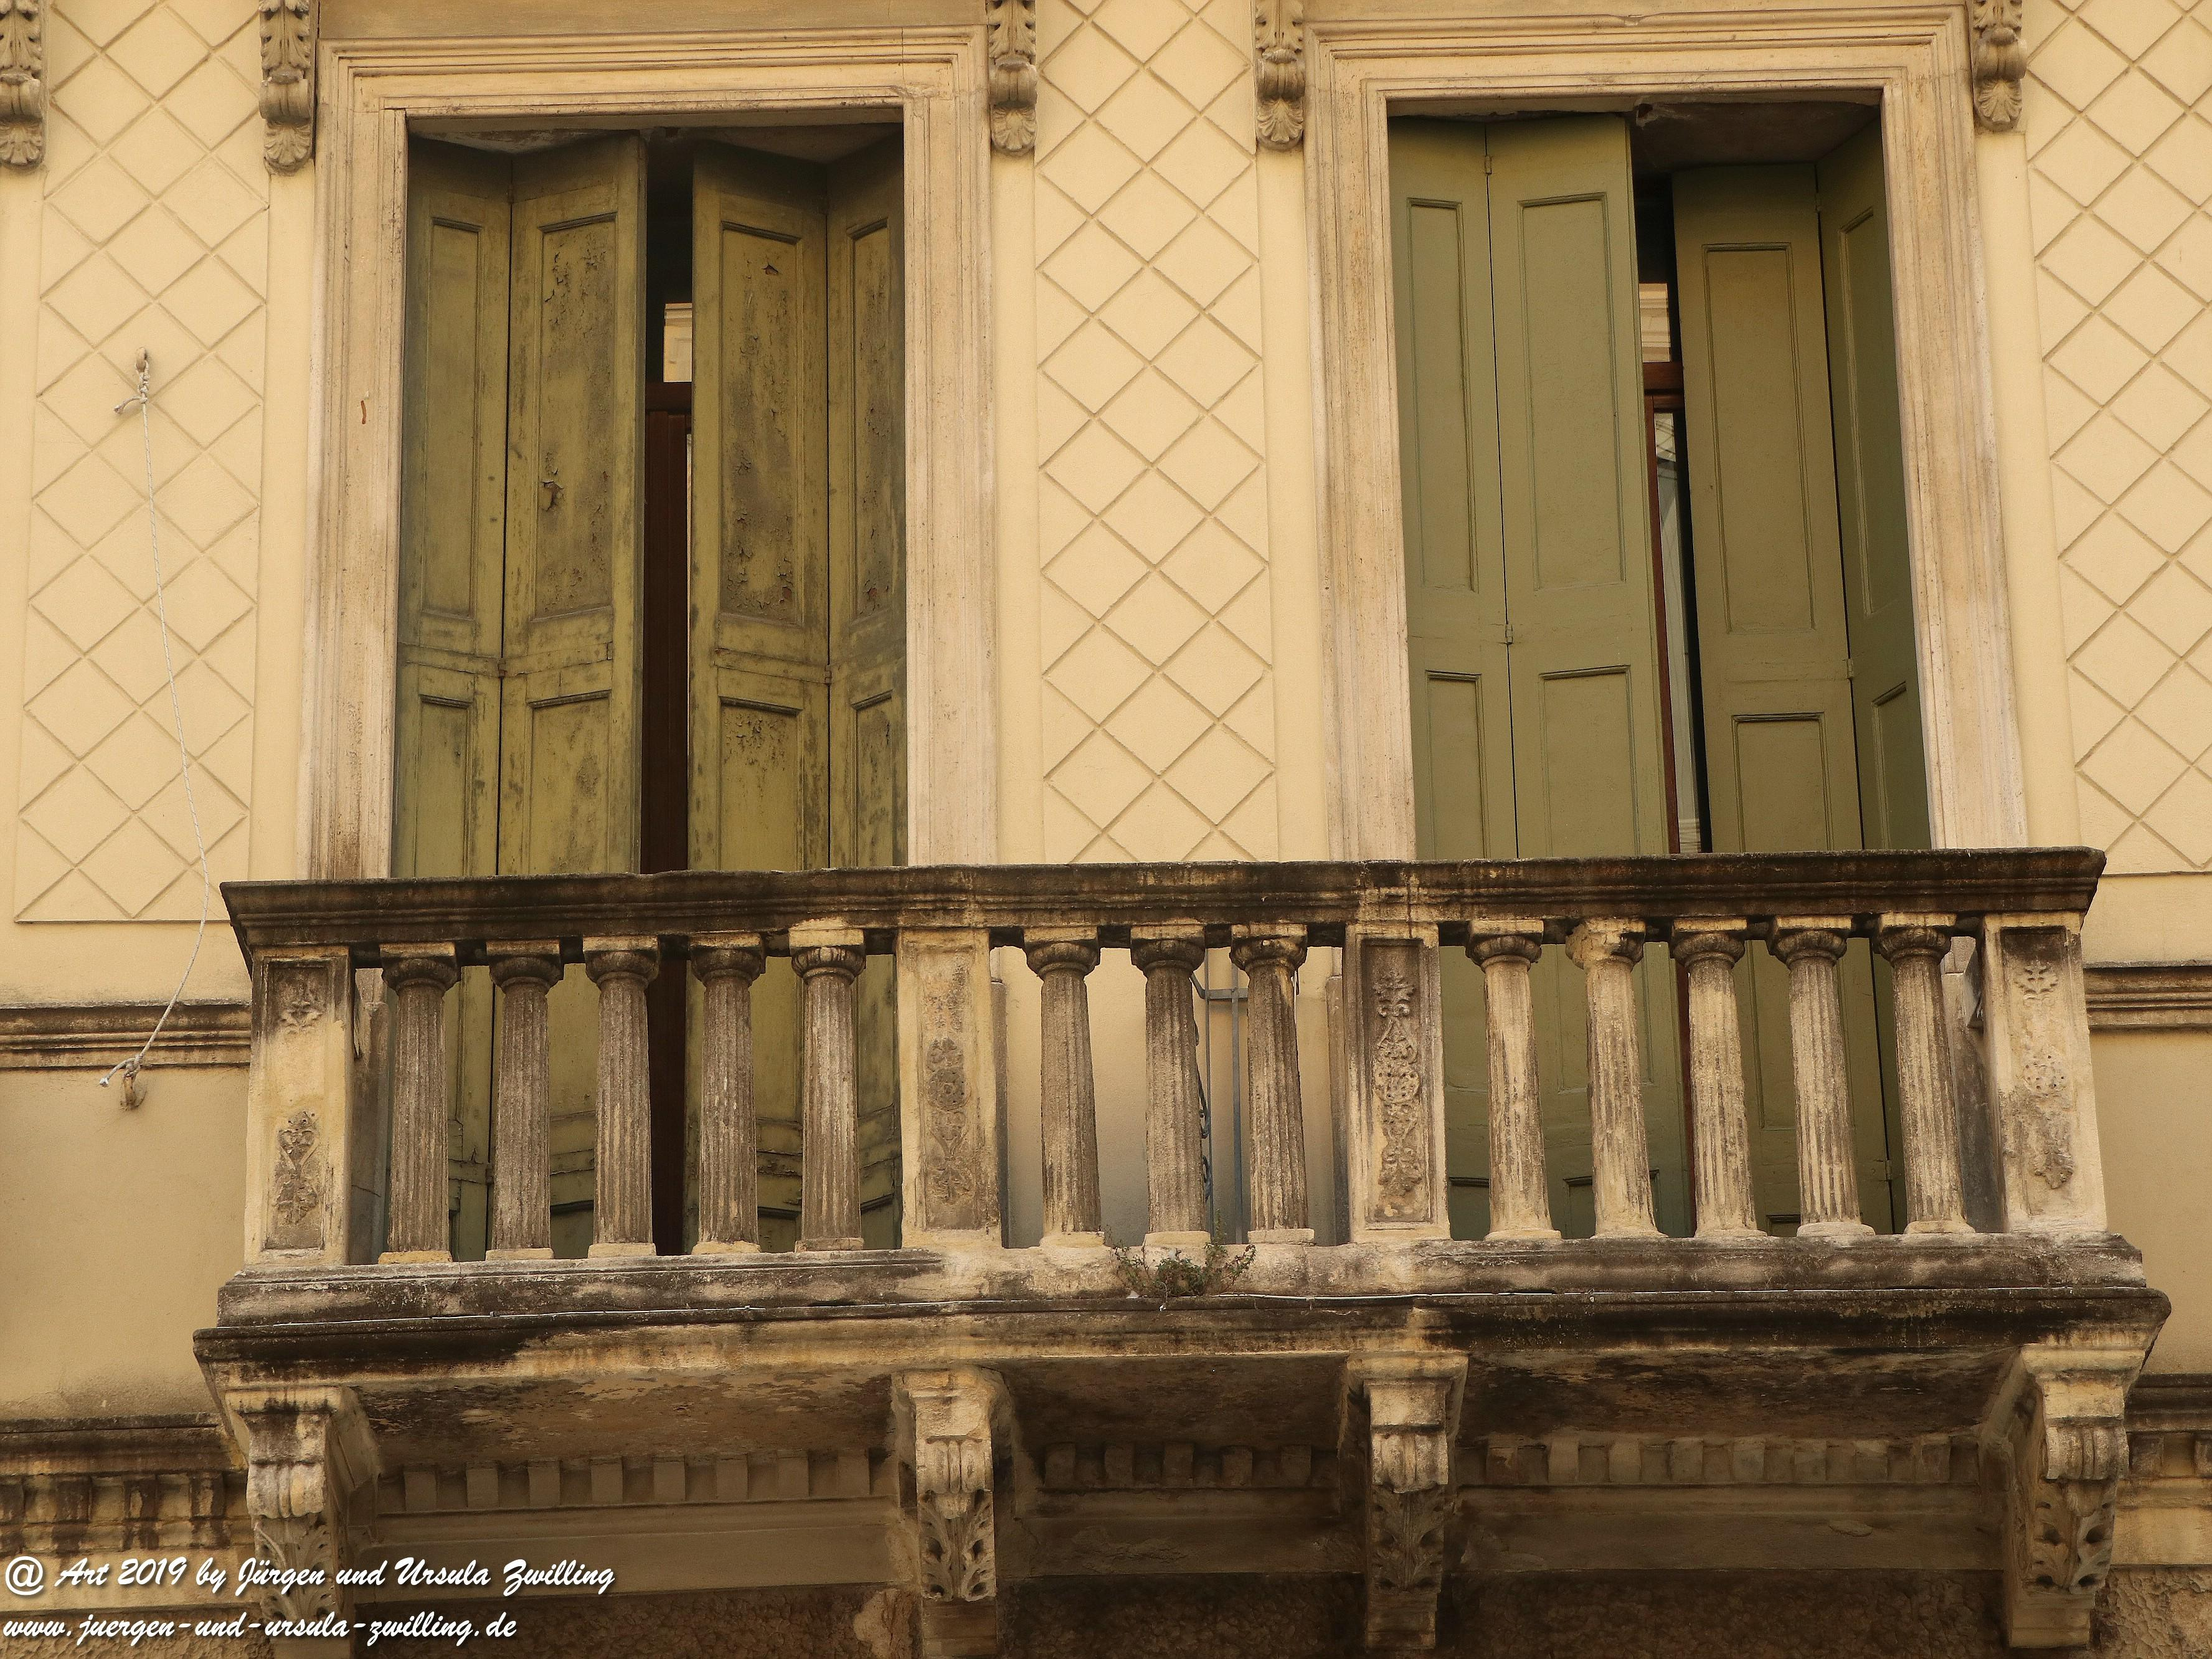 Padua - Padova 1